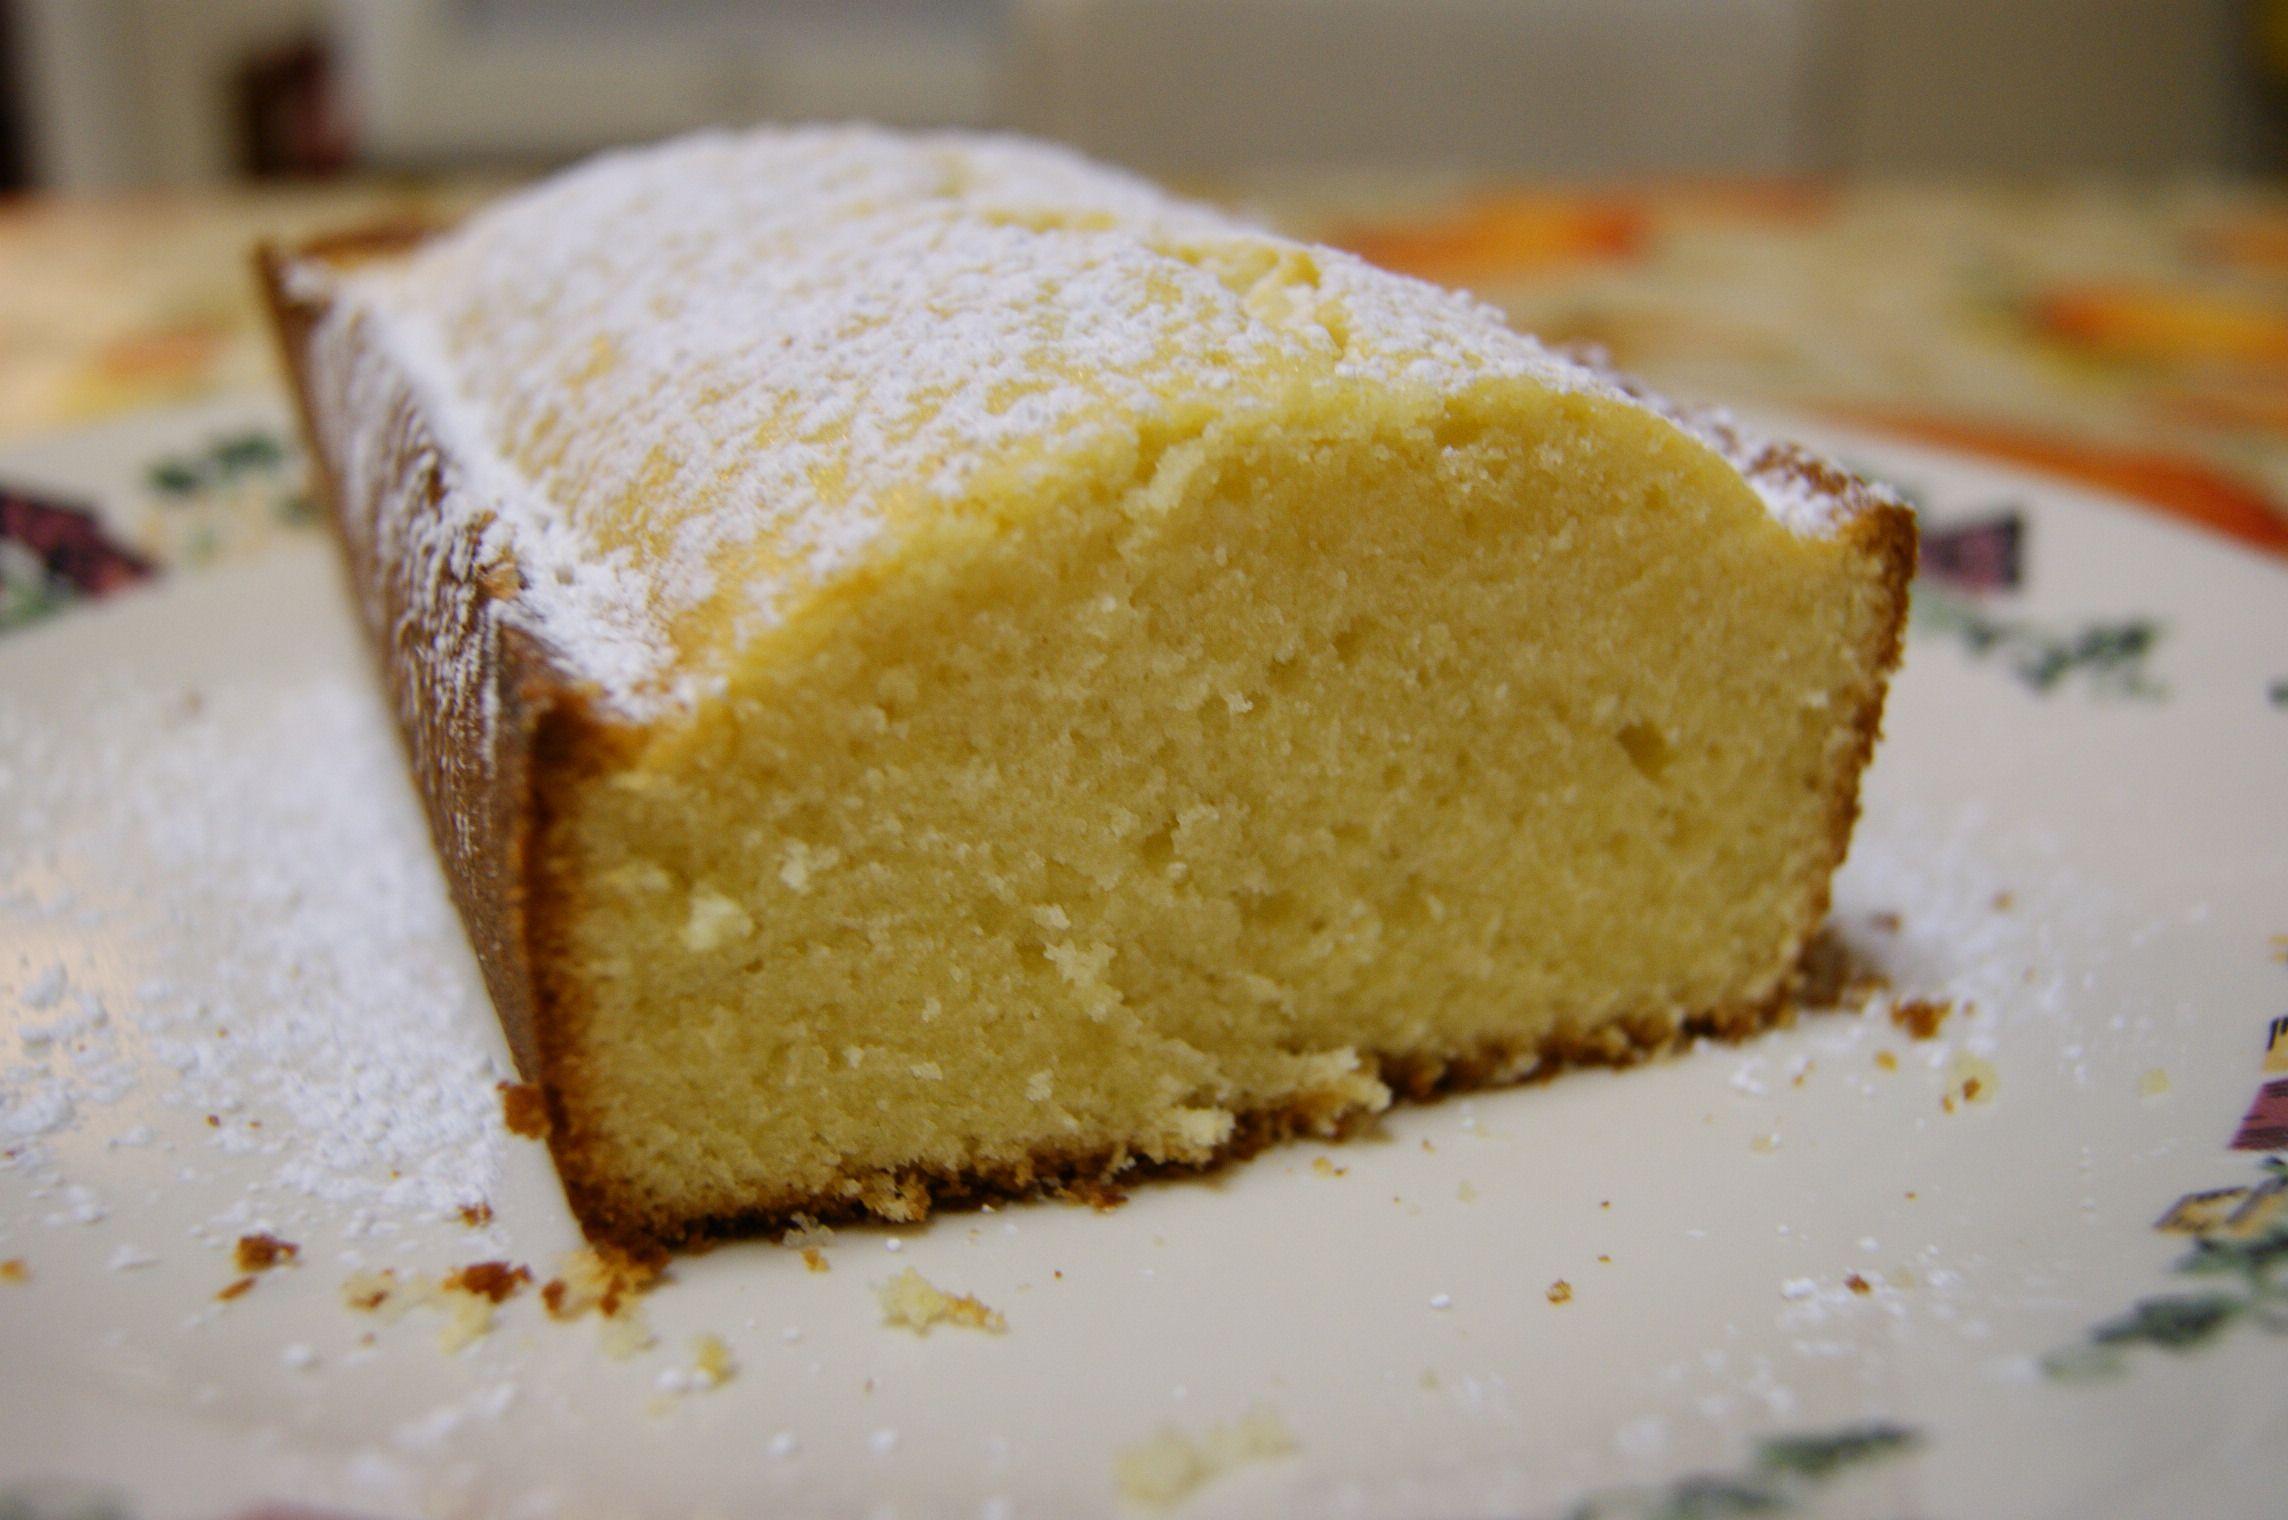 Philly Fluff Cake Recipe At Www Welcometorosale Com